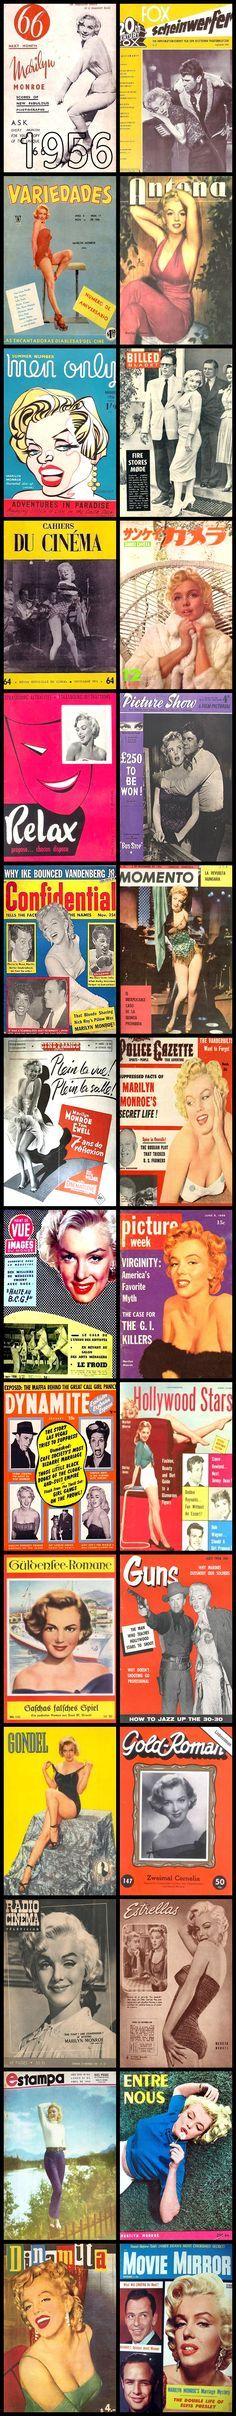 1956 magazine covers of Marilyn Monroe